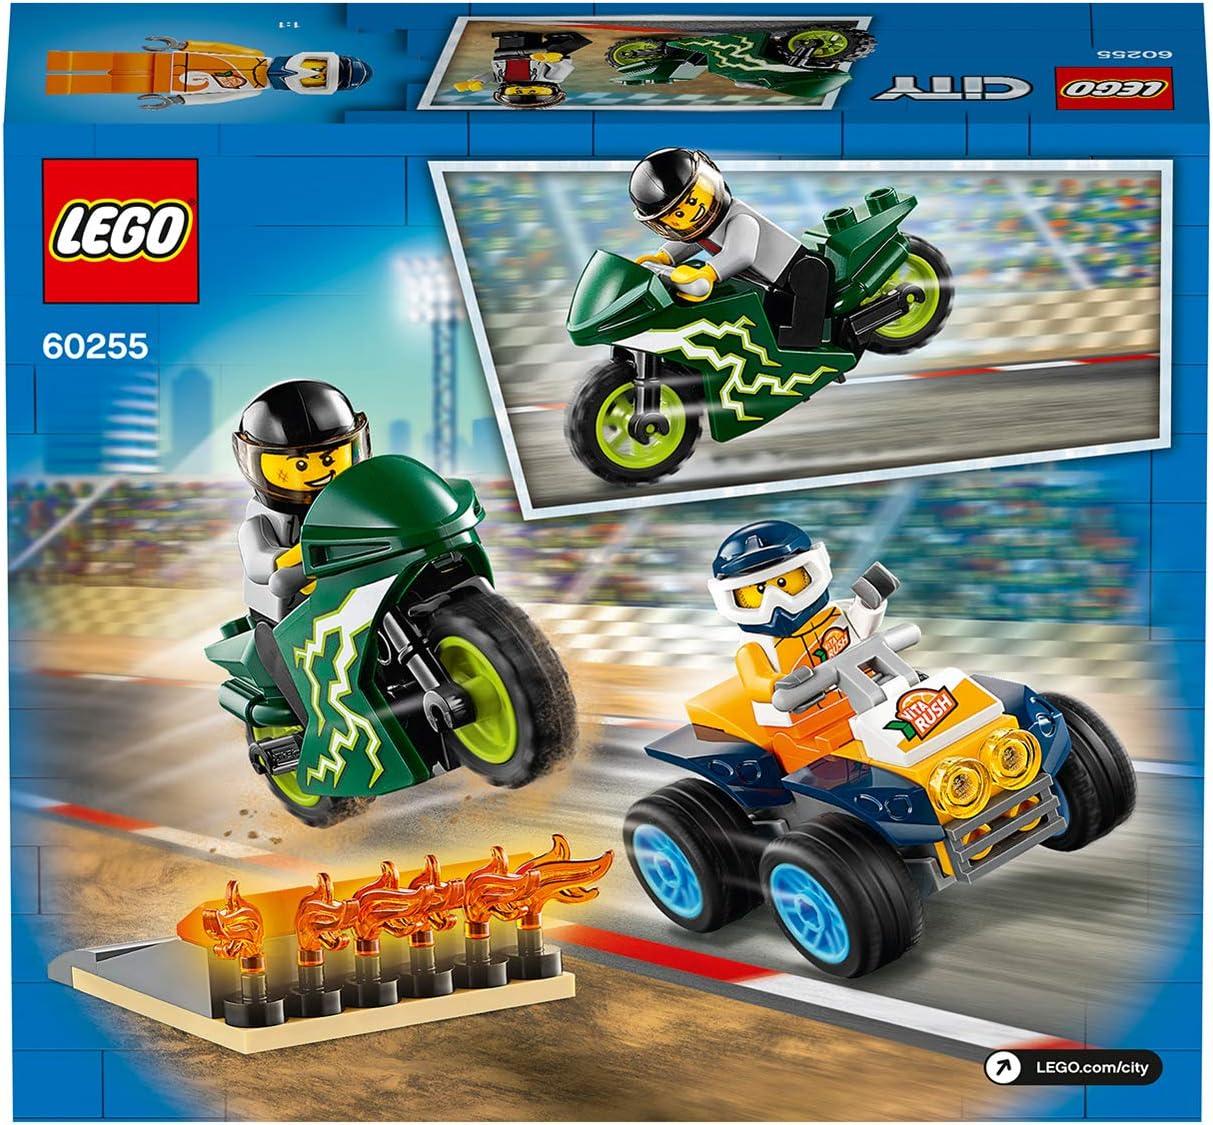 LEGO 60255 City Nitro Wheels Stunt Team Playset with ATV Quad Bike Motorbike and Stunt Ramp with Flames